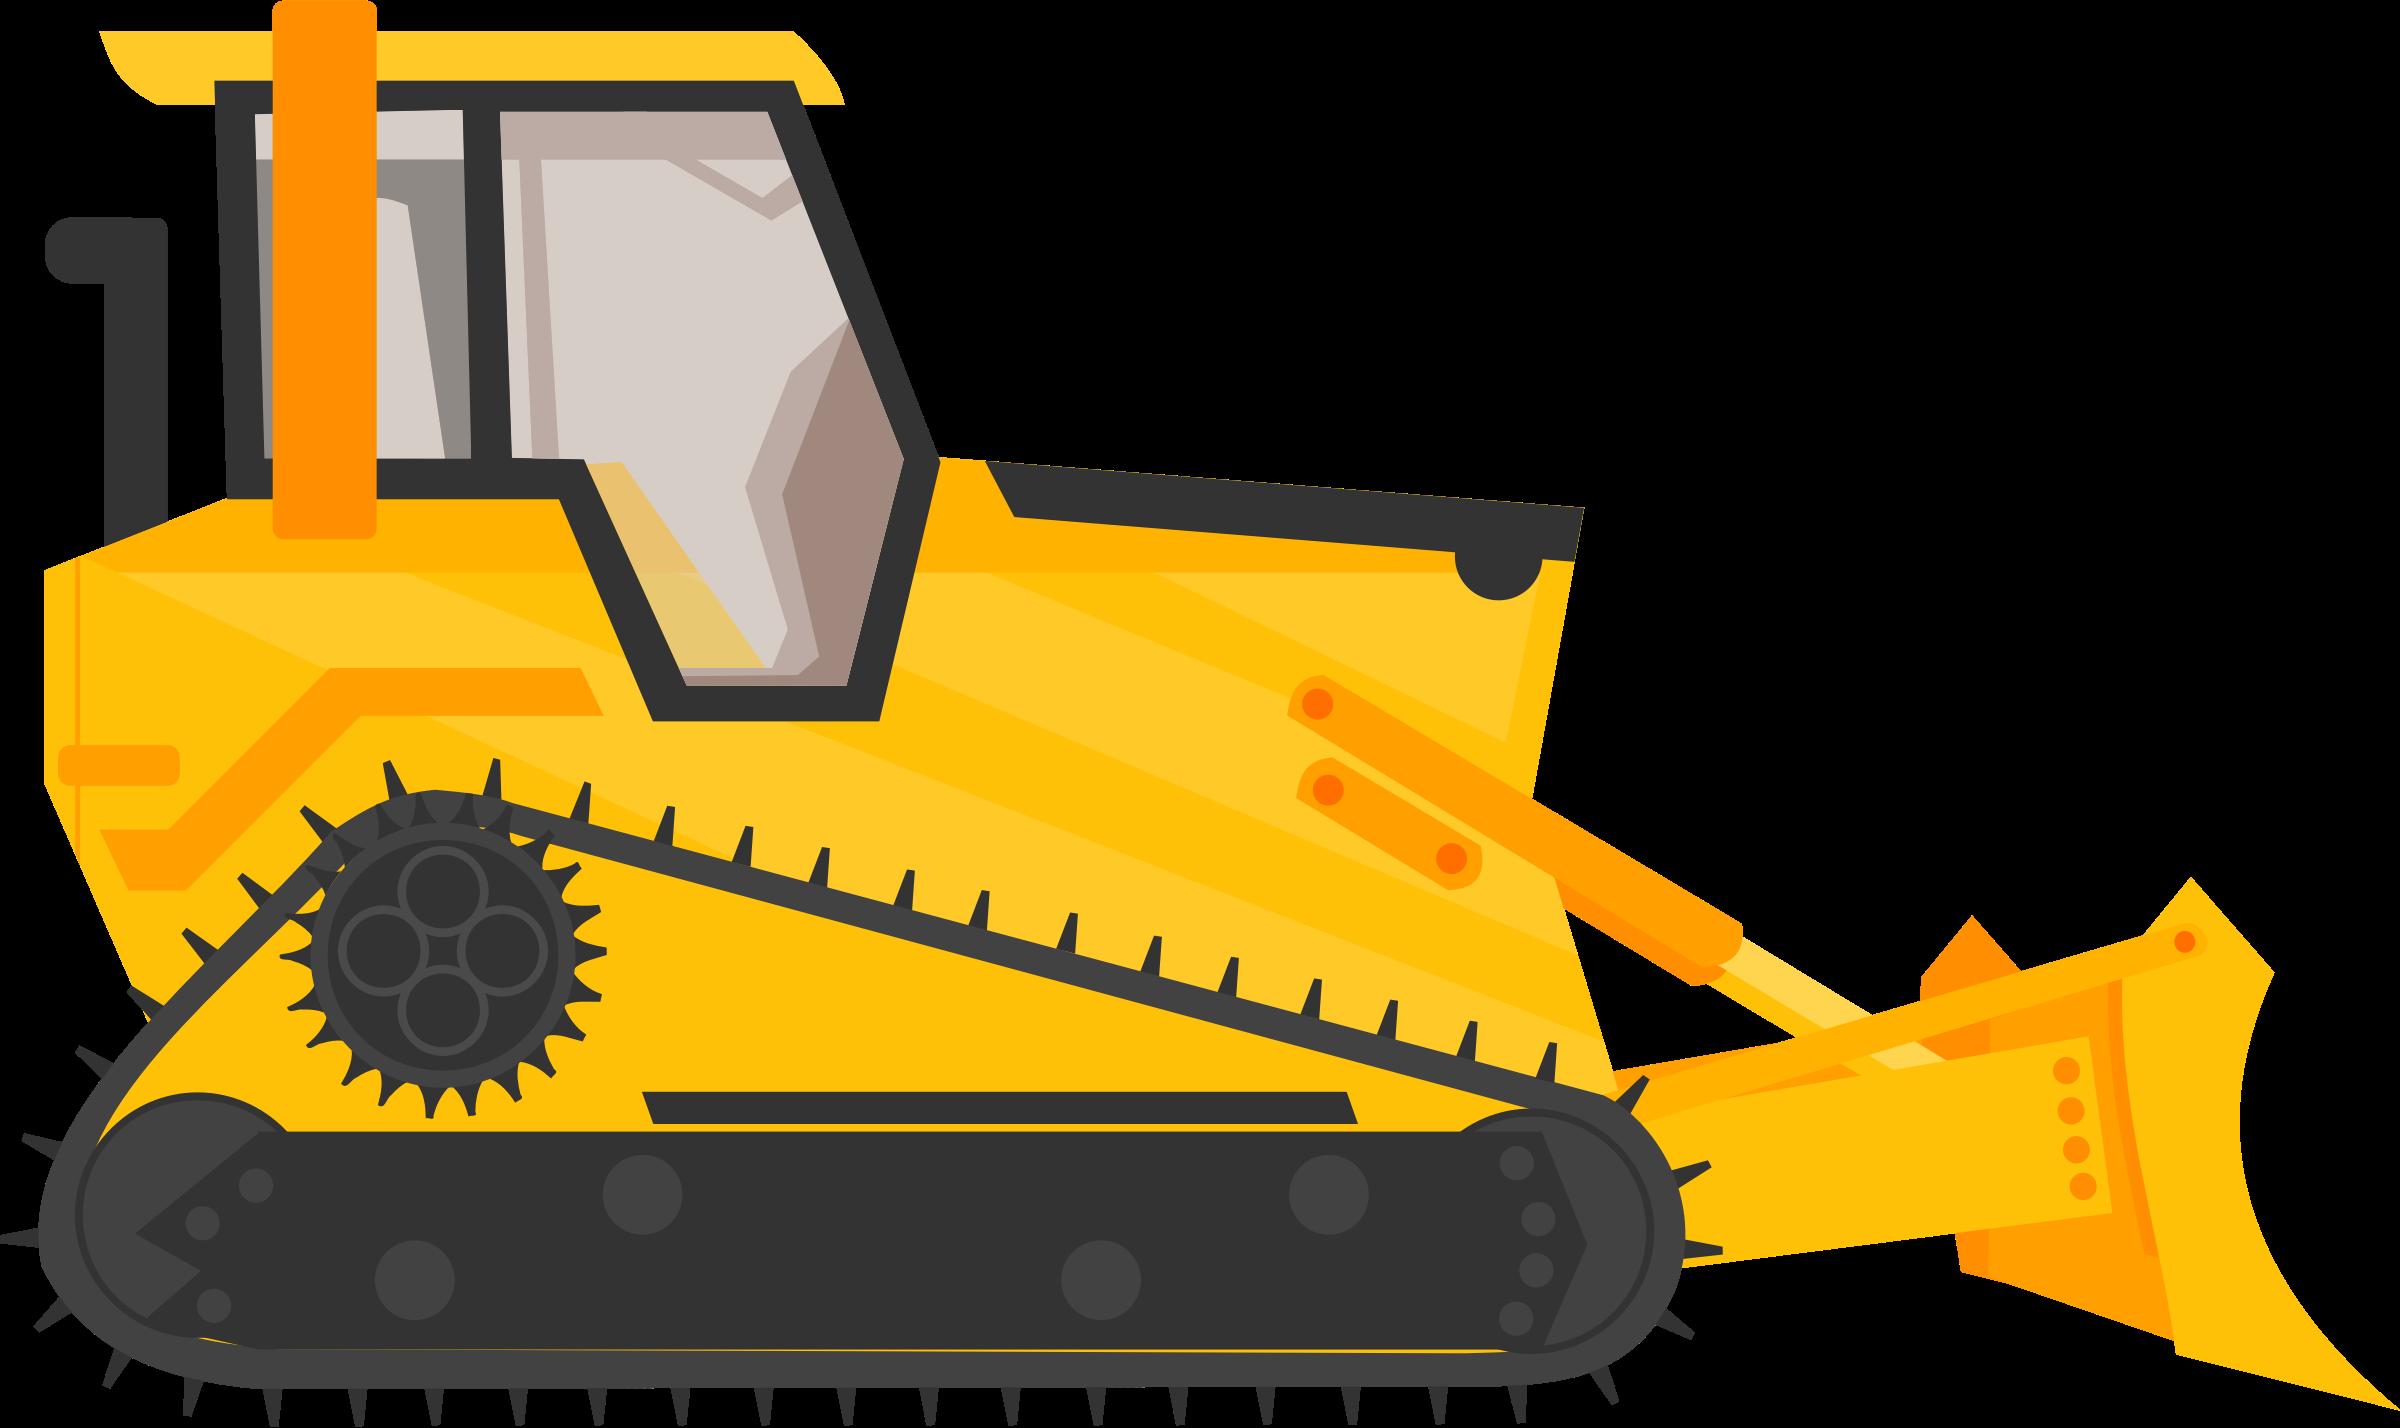 Bulldozer Excavator Heavy Machinery Construction.